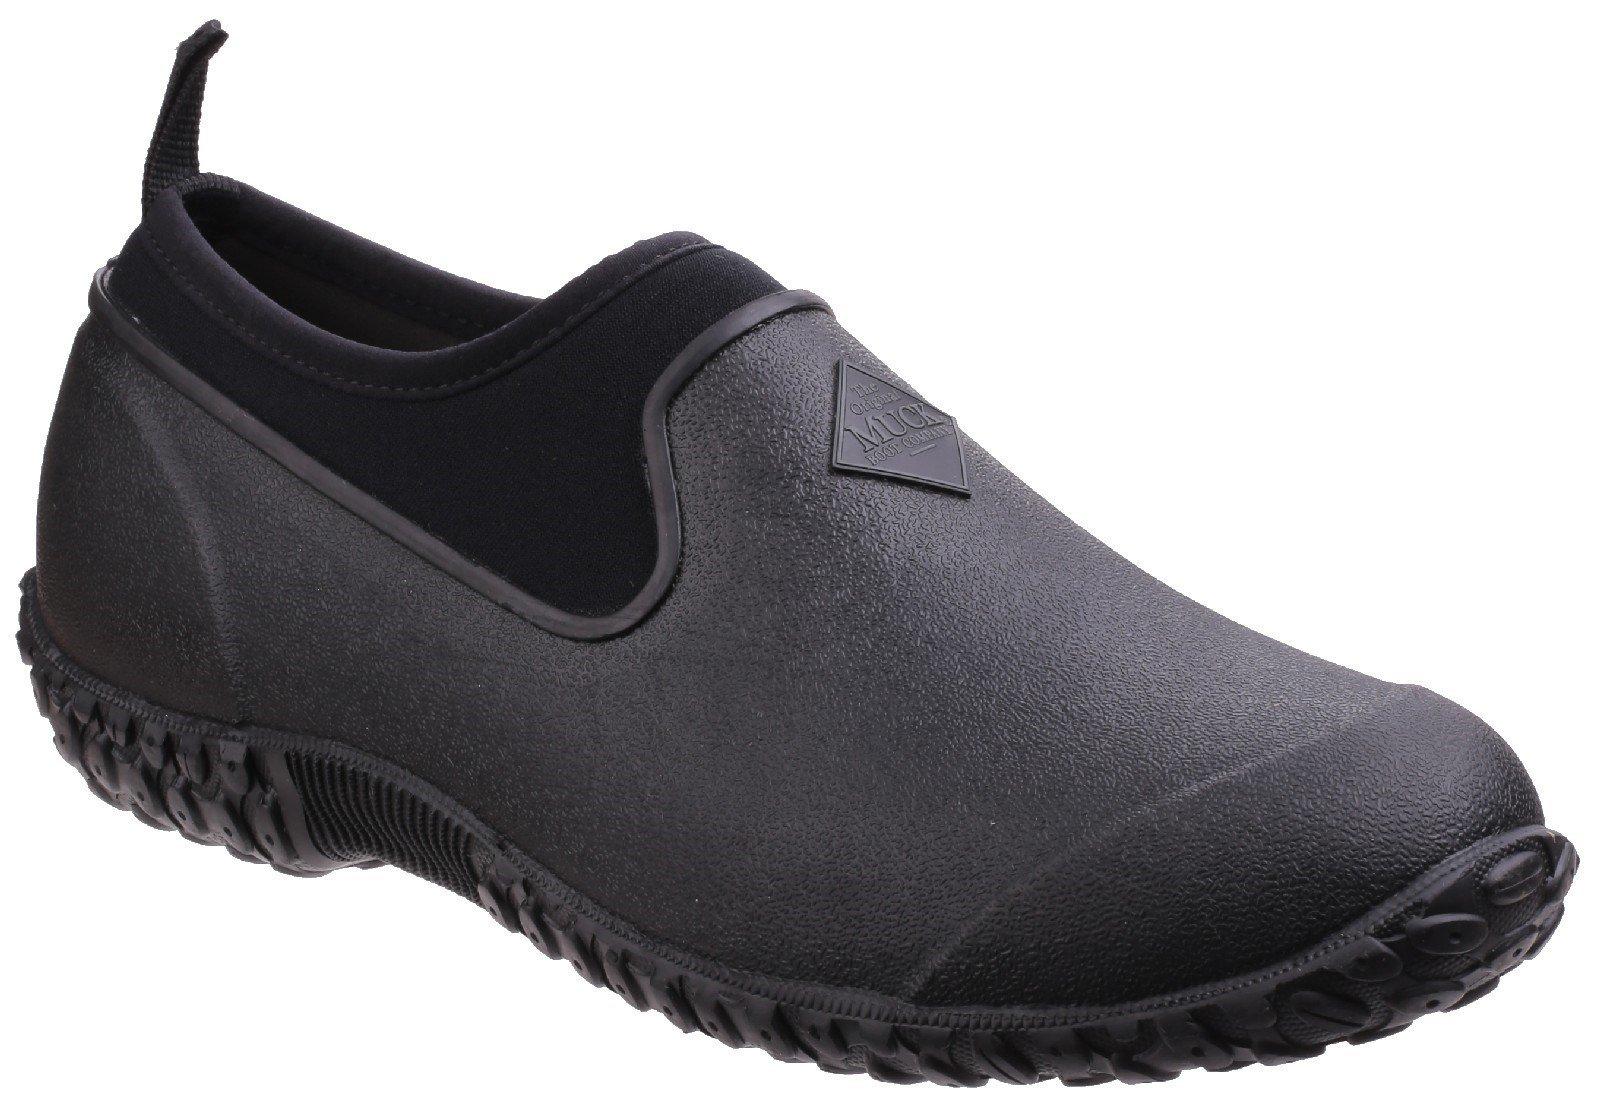 Muck Boots Women's Muckster II Low All Purpose Lightweight Shoe Various Colours 25900 - Black 3